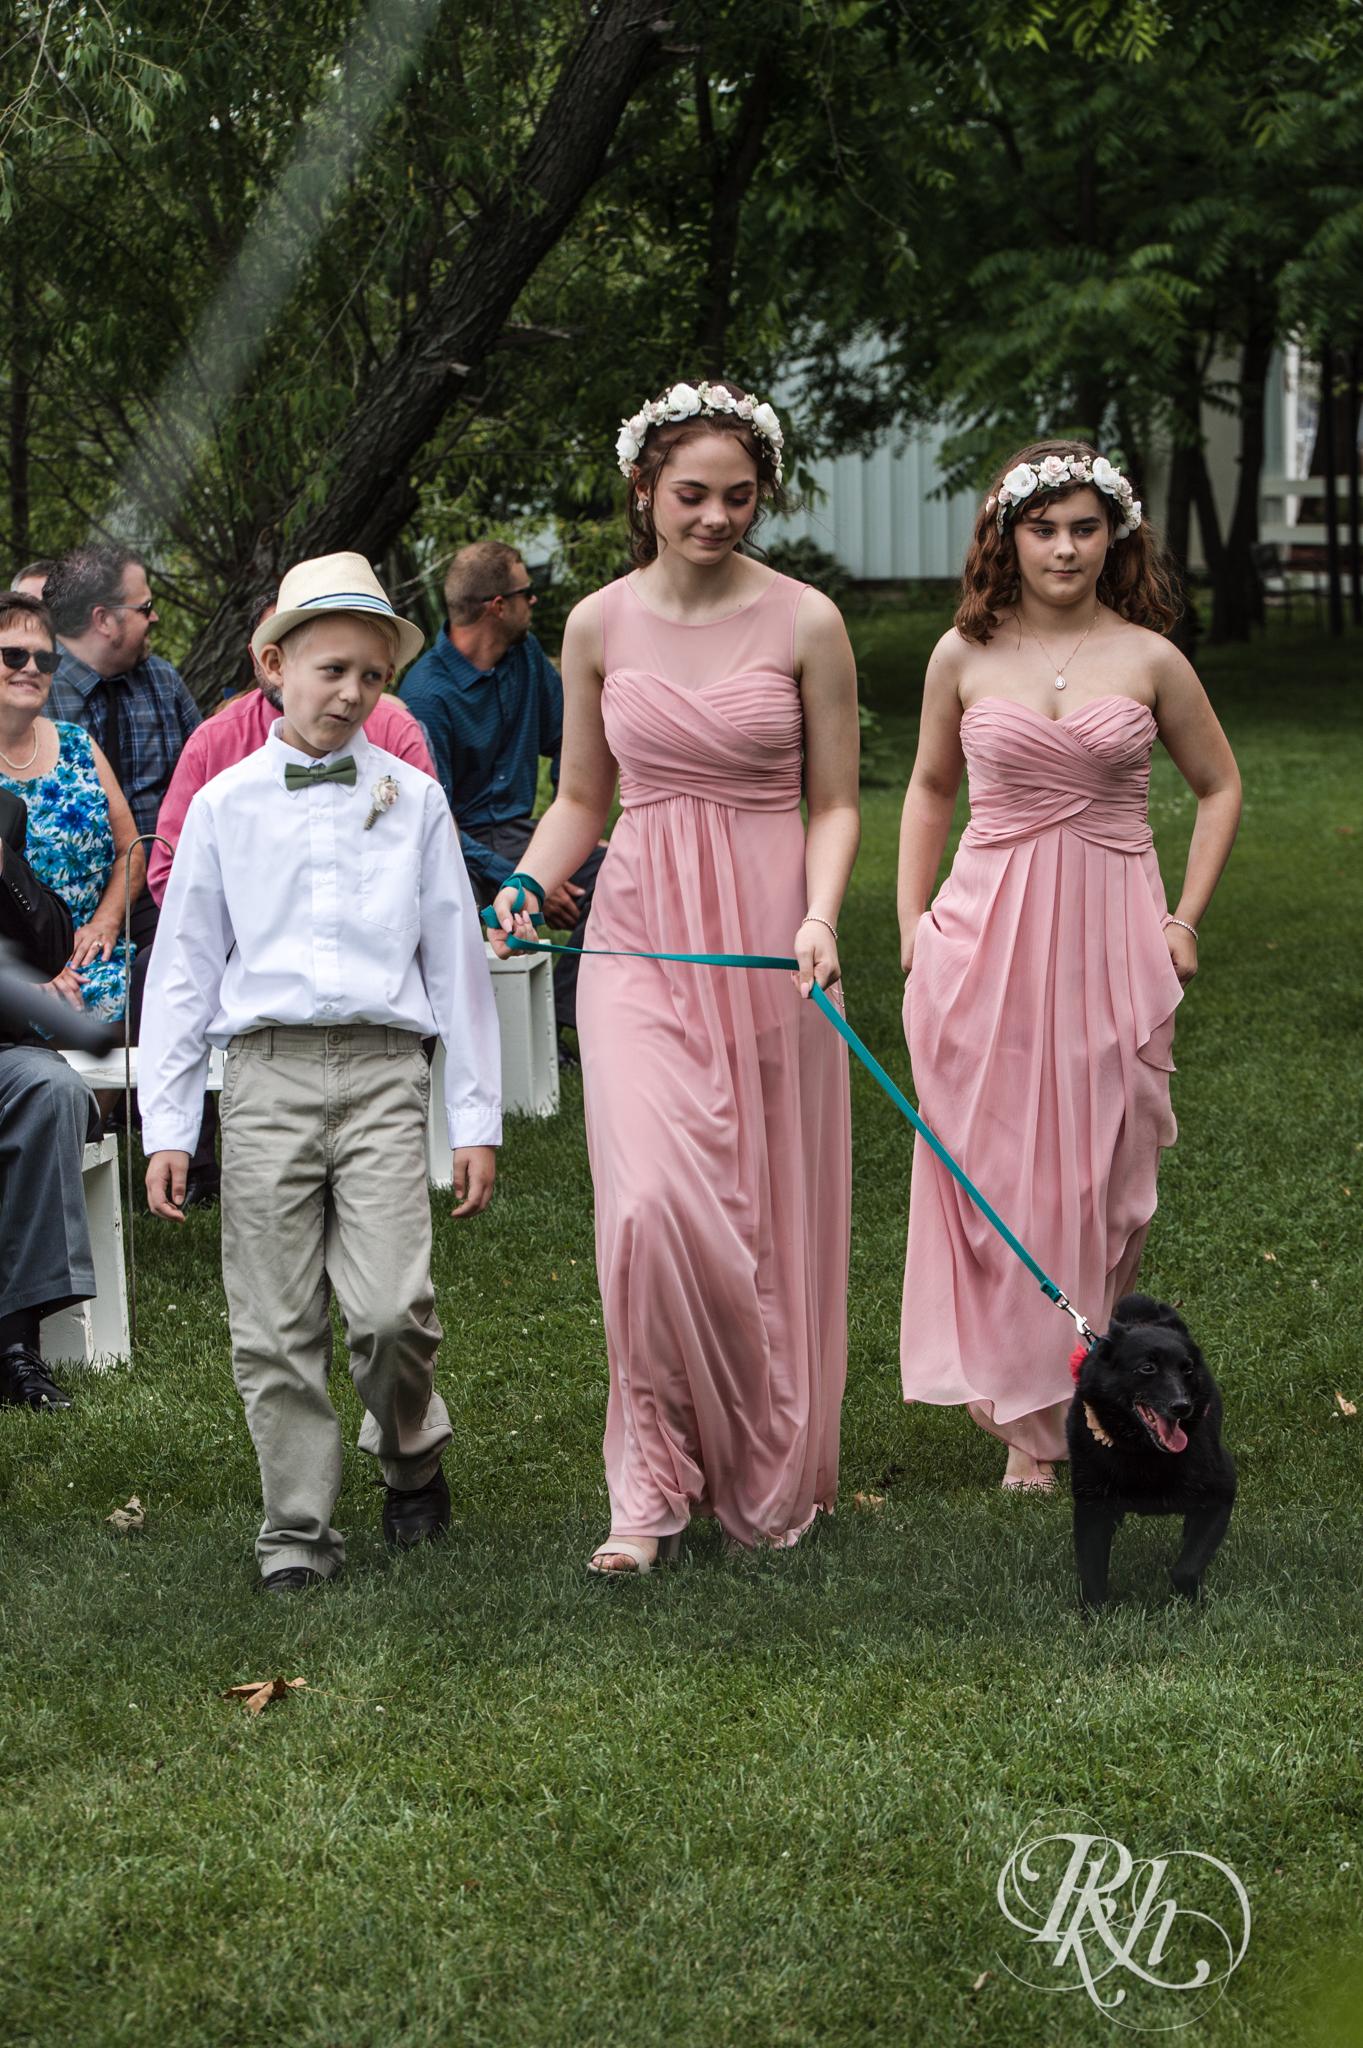 Ally & Nick - Minnesota Wedding Photography - Next Chapter Winery - RKH Images - Blog (13 of 57).jpg